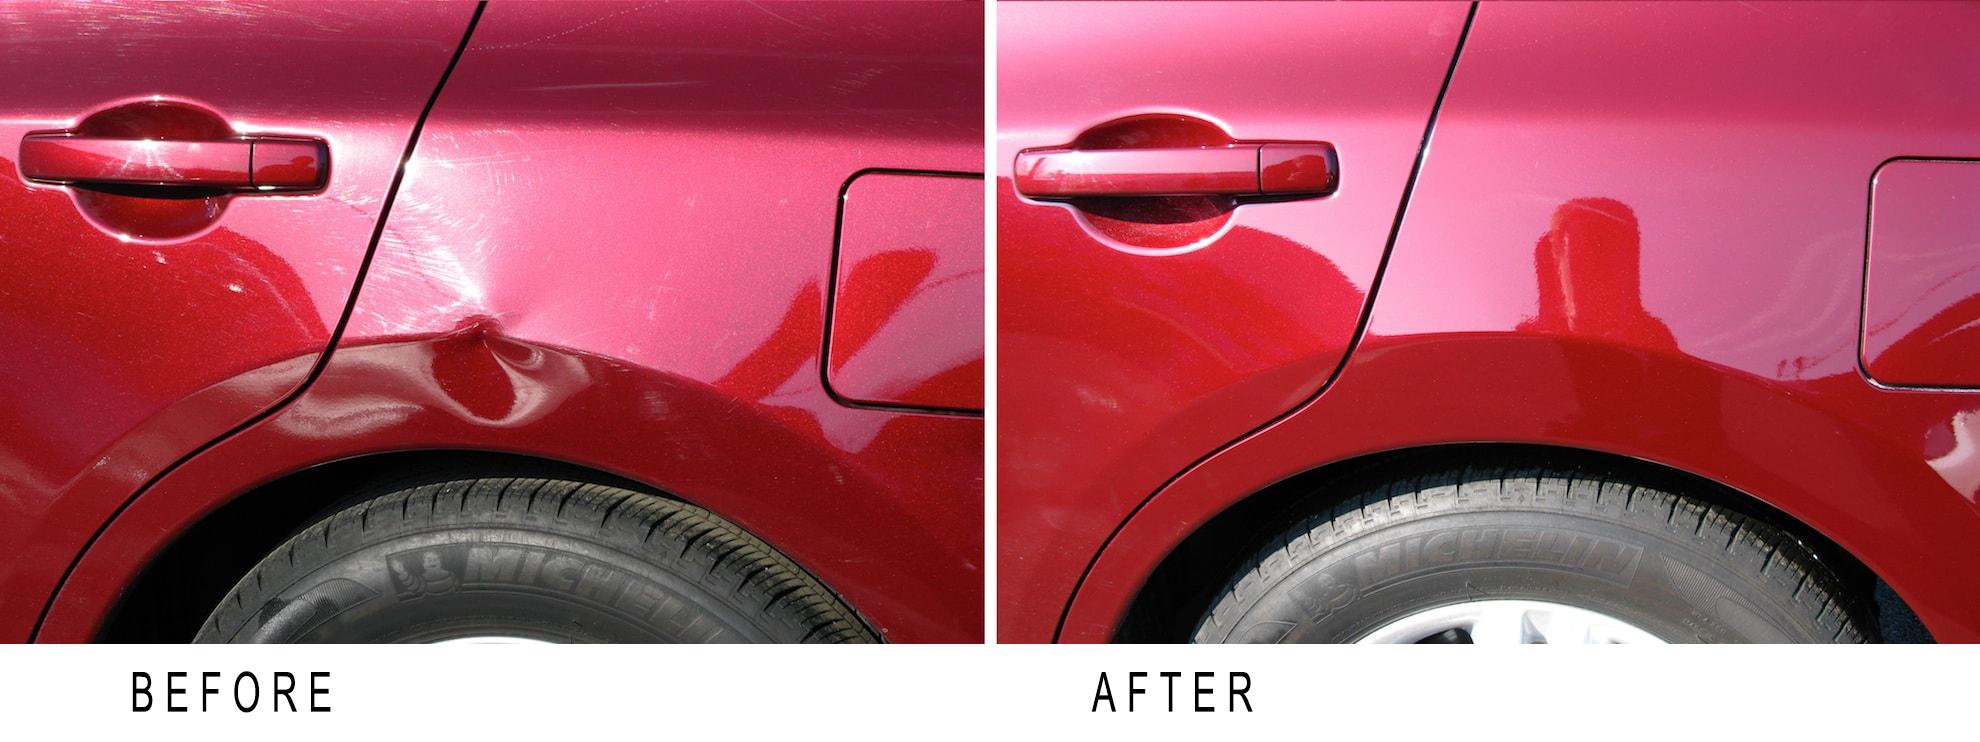 Paintless Dent removal, paintless dent repair,